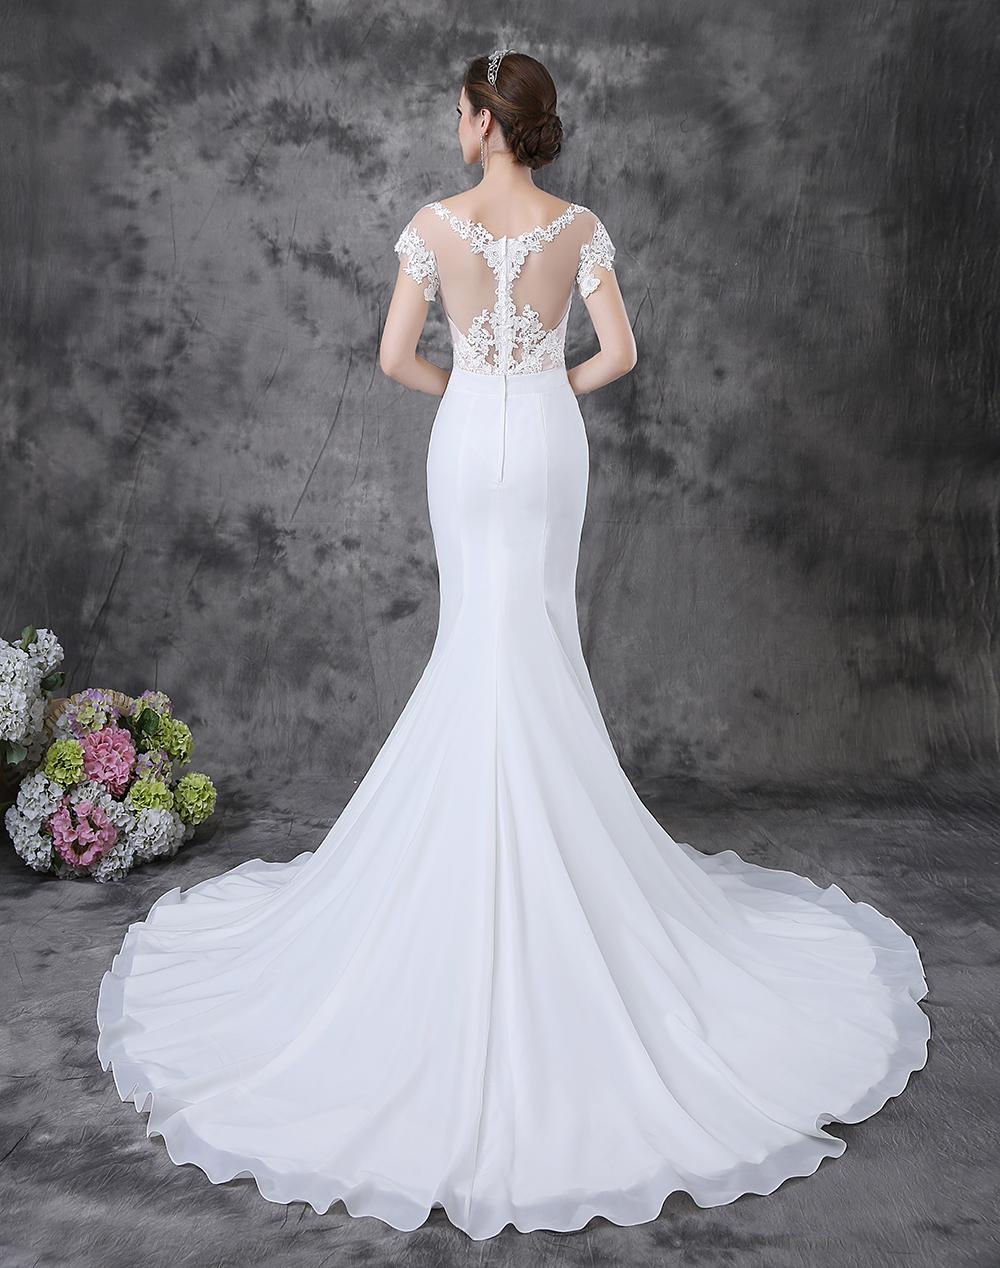 Aliexpresscom  Buy Elegant Short Sleeve Lace Top Long Tail Mermaid Corset Wedding Dresses from